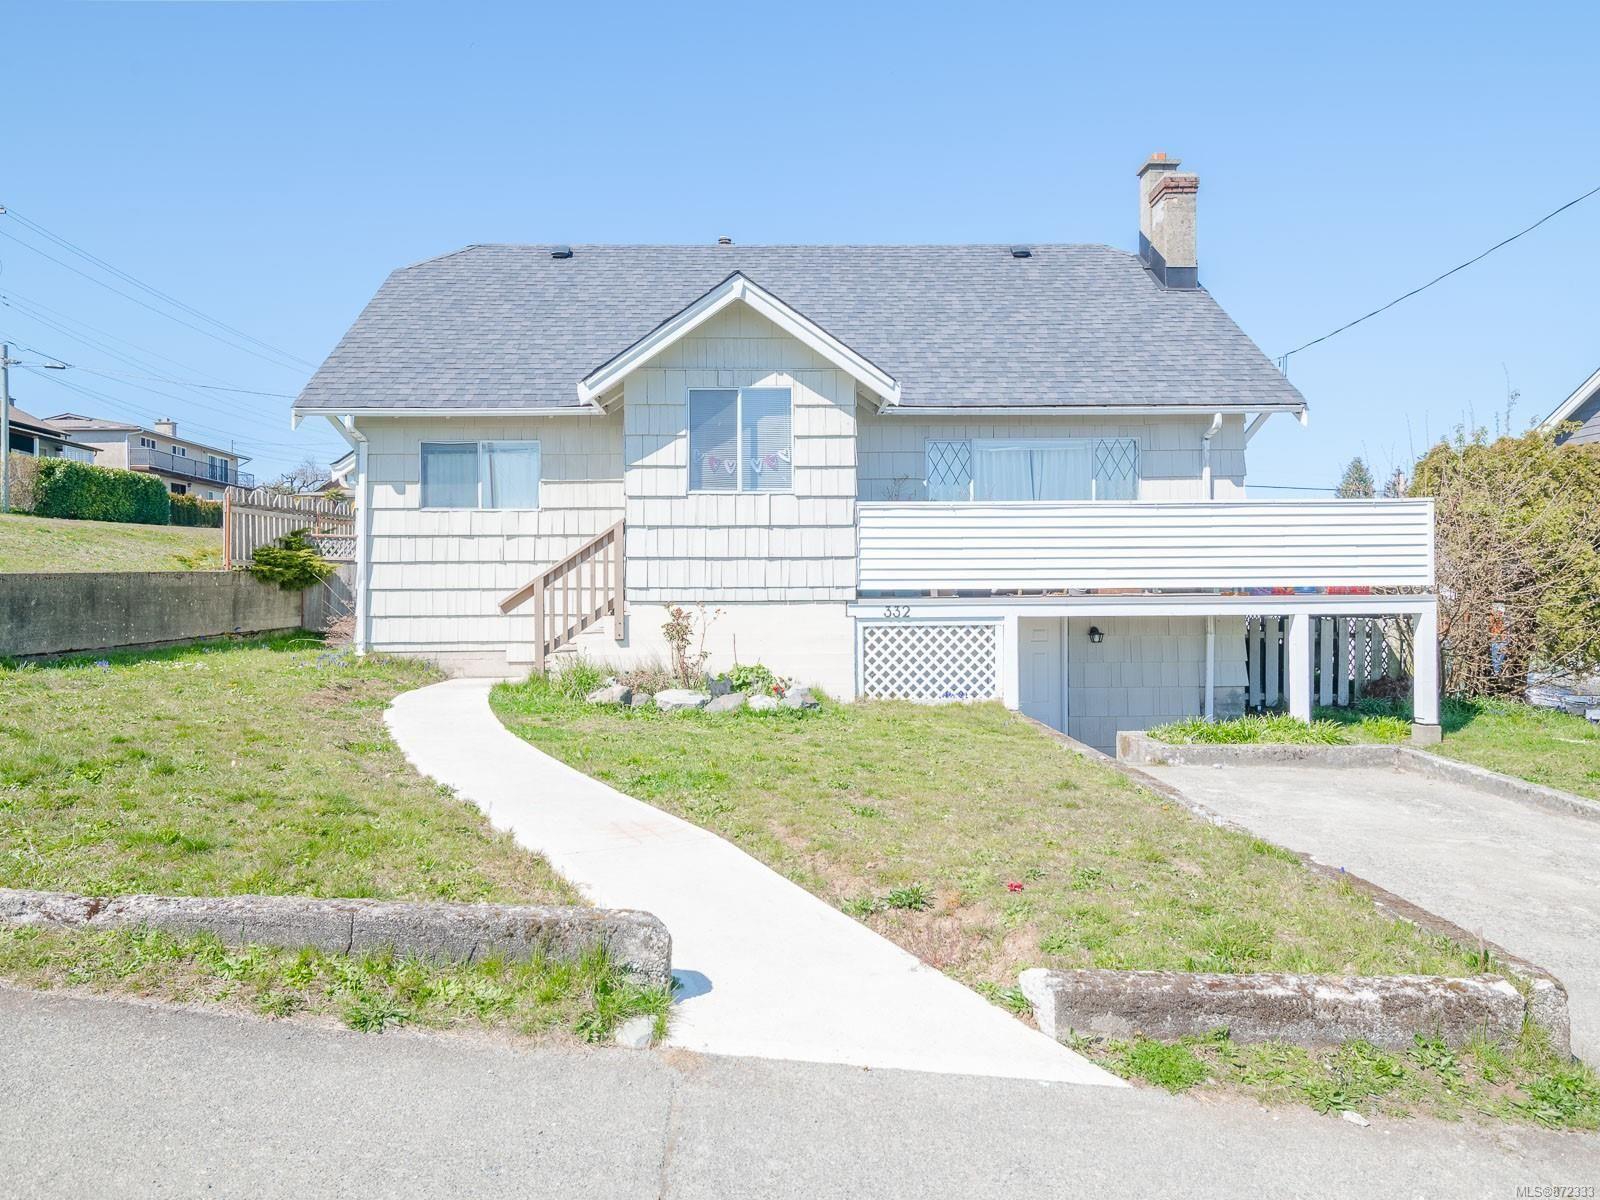 Main Photo: 332 Methuen St in : Du Ladysmith House for sale (Duncan)  : MLS®# 872333